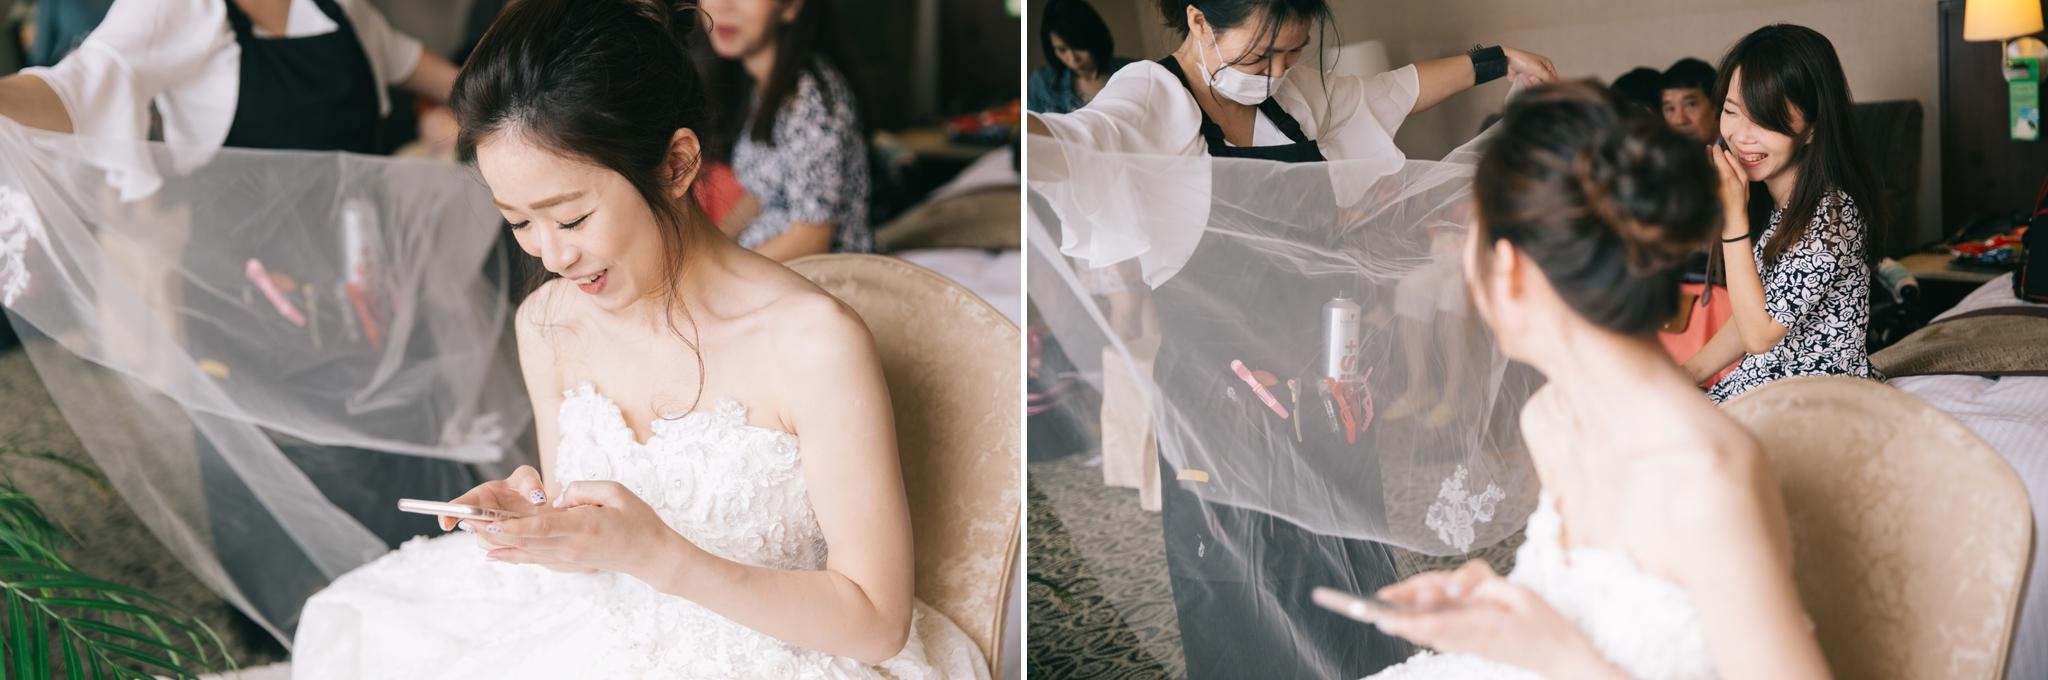 Tina+Nash-wedding-台北婚禮迎娶晚宴-新莊終身大事-007.jpg